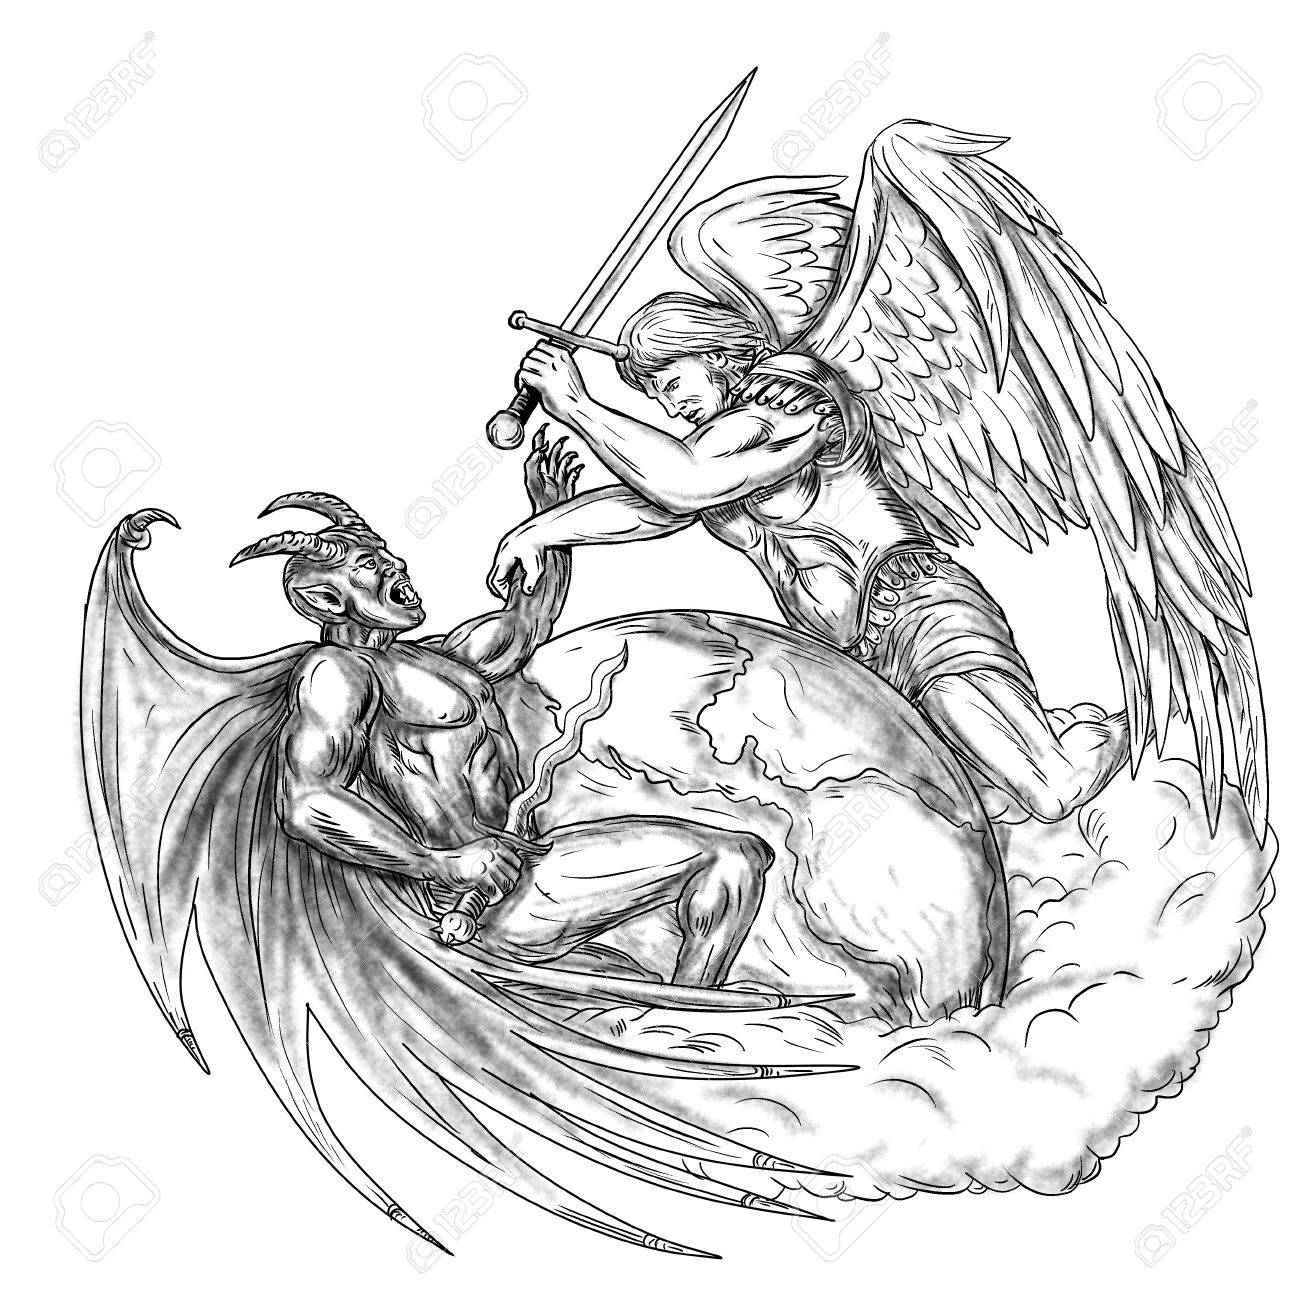 1300x1300 Tattoo Style Illustration Of Saint Michael The Archangel Angel